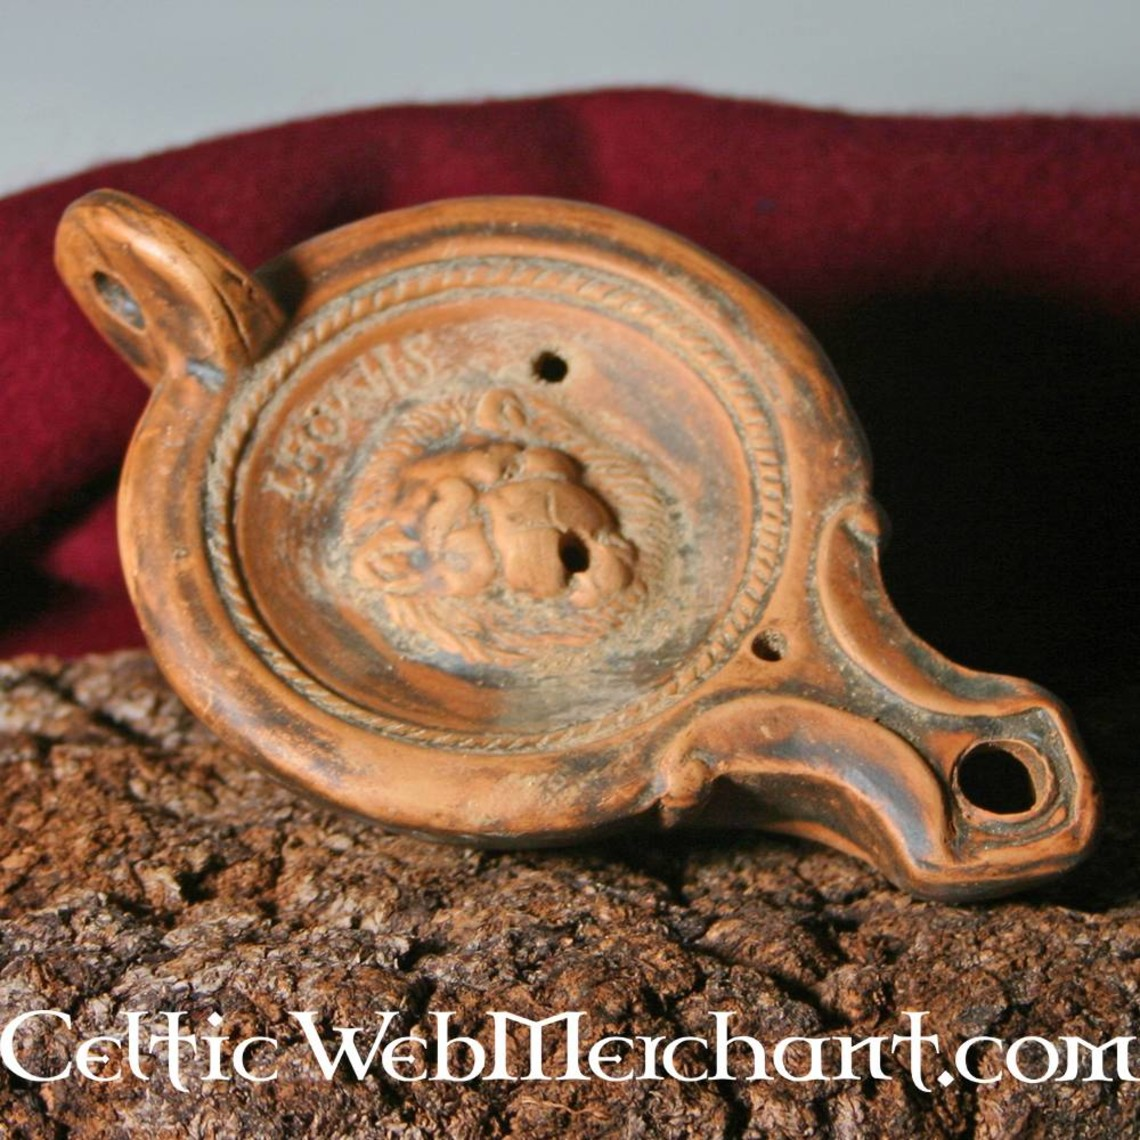 Lampada ad olio romana leone